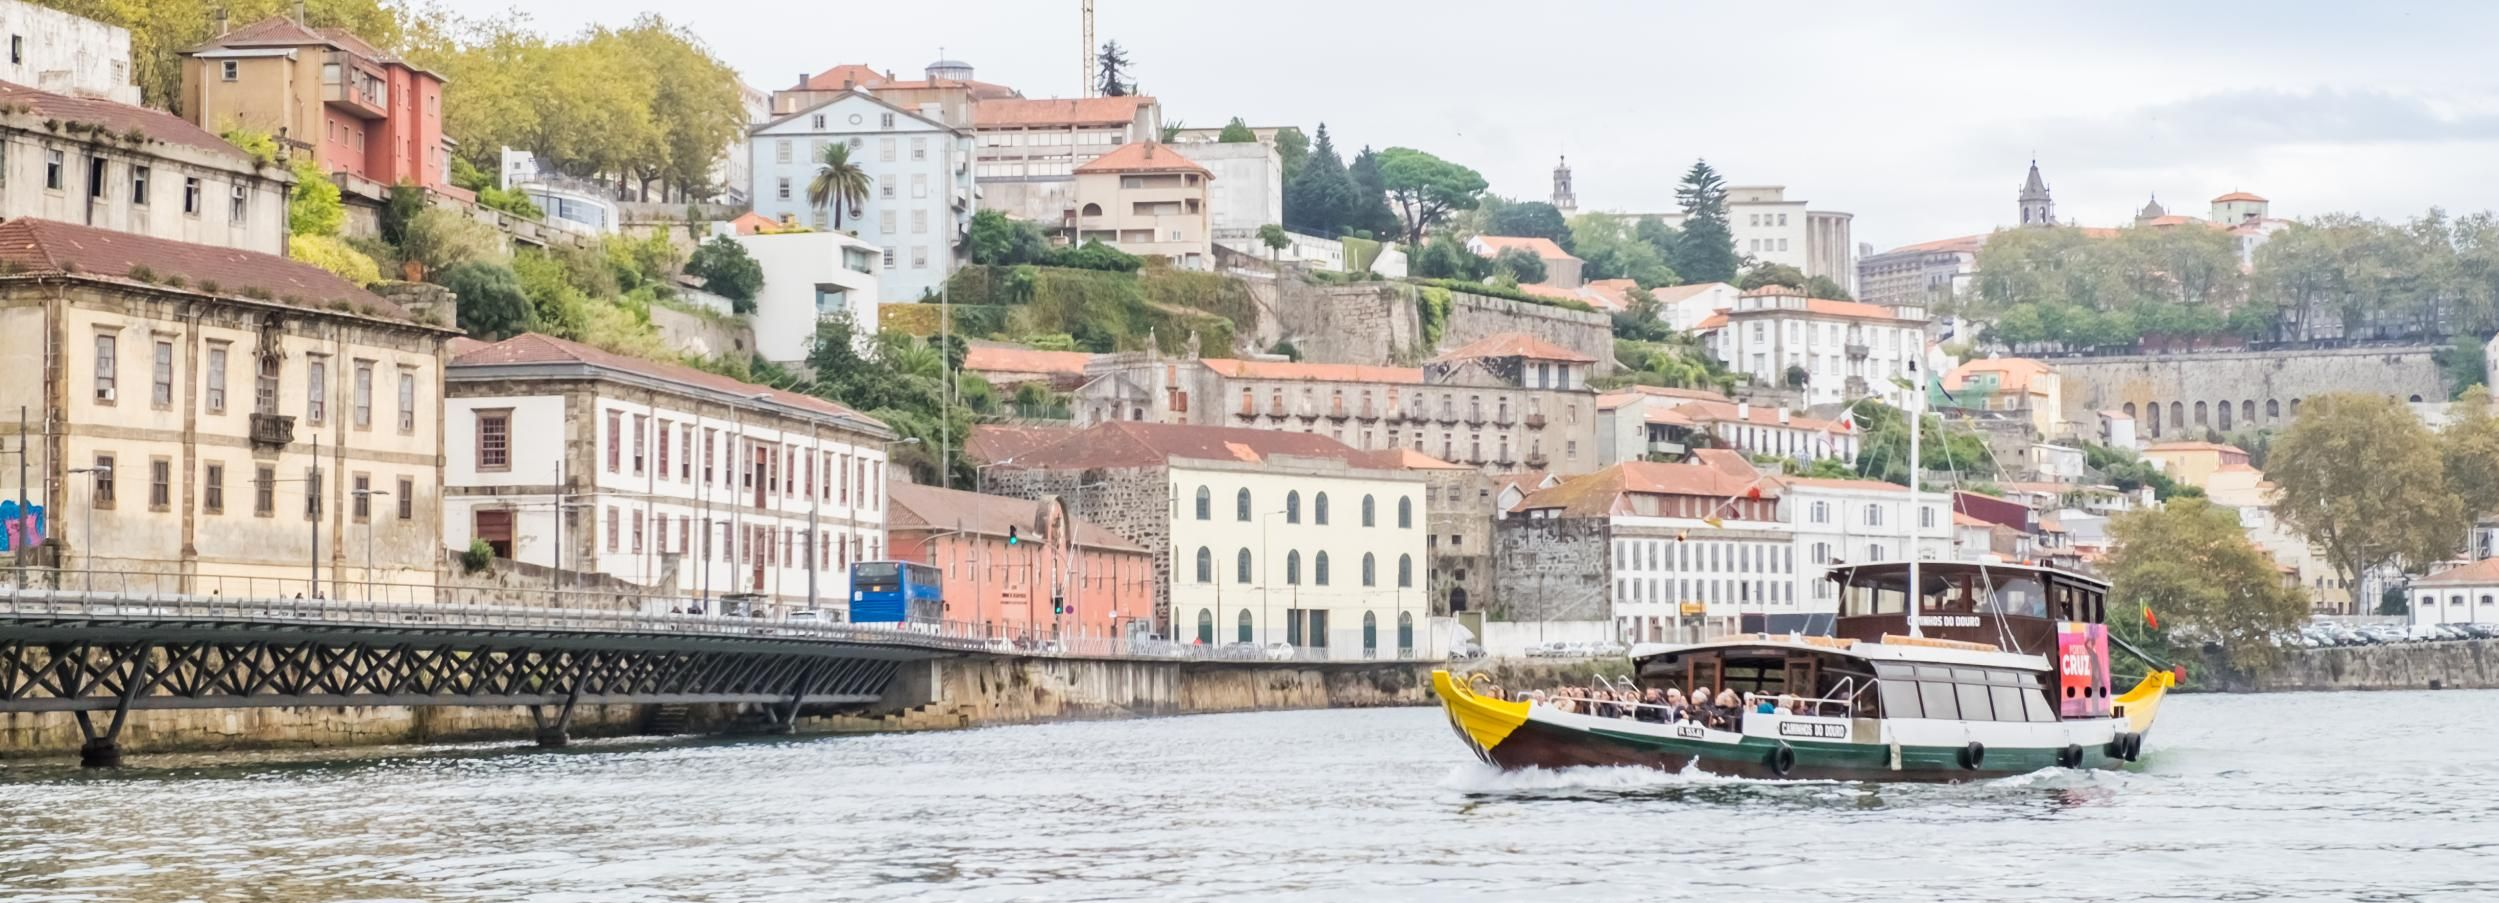 Porto: Hop-On/Hop-Off-Bustour, Schifffahrt & Weinprobe